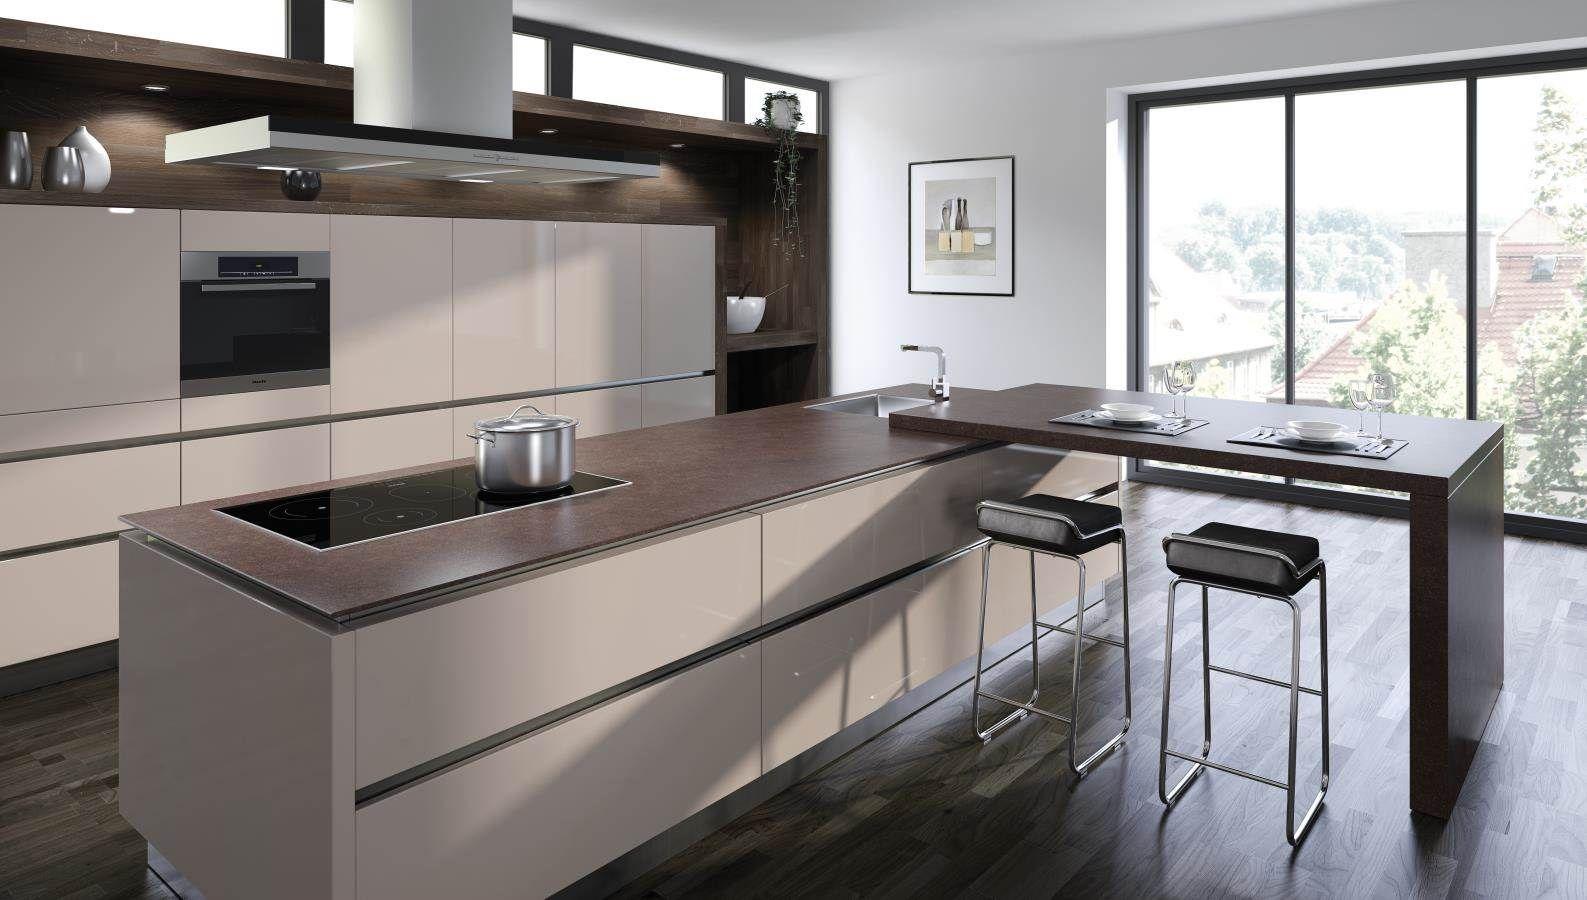 küchenarbeitsplatten aus quarz design: canosa, Badezimmer ideen